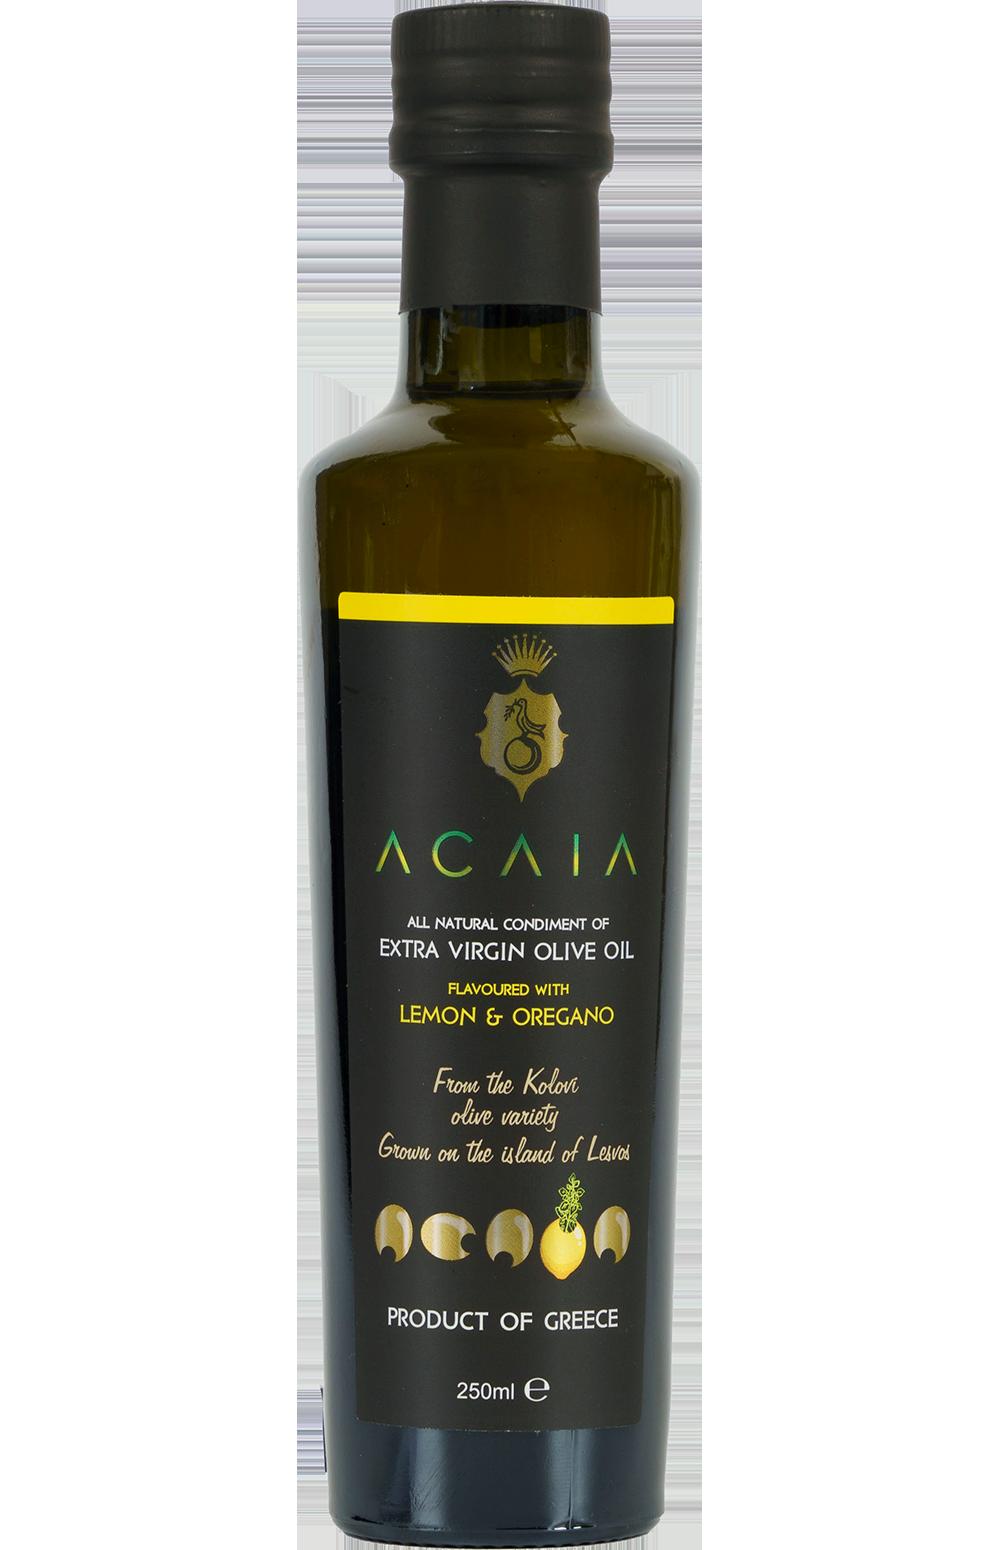 Acaia Lemon & Oregano